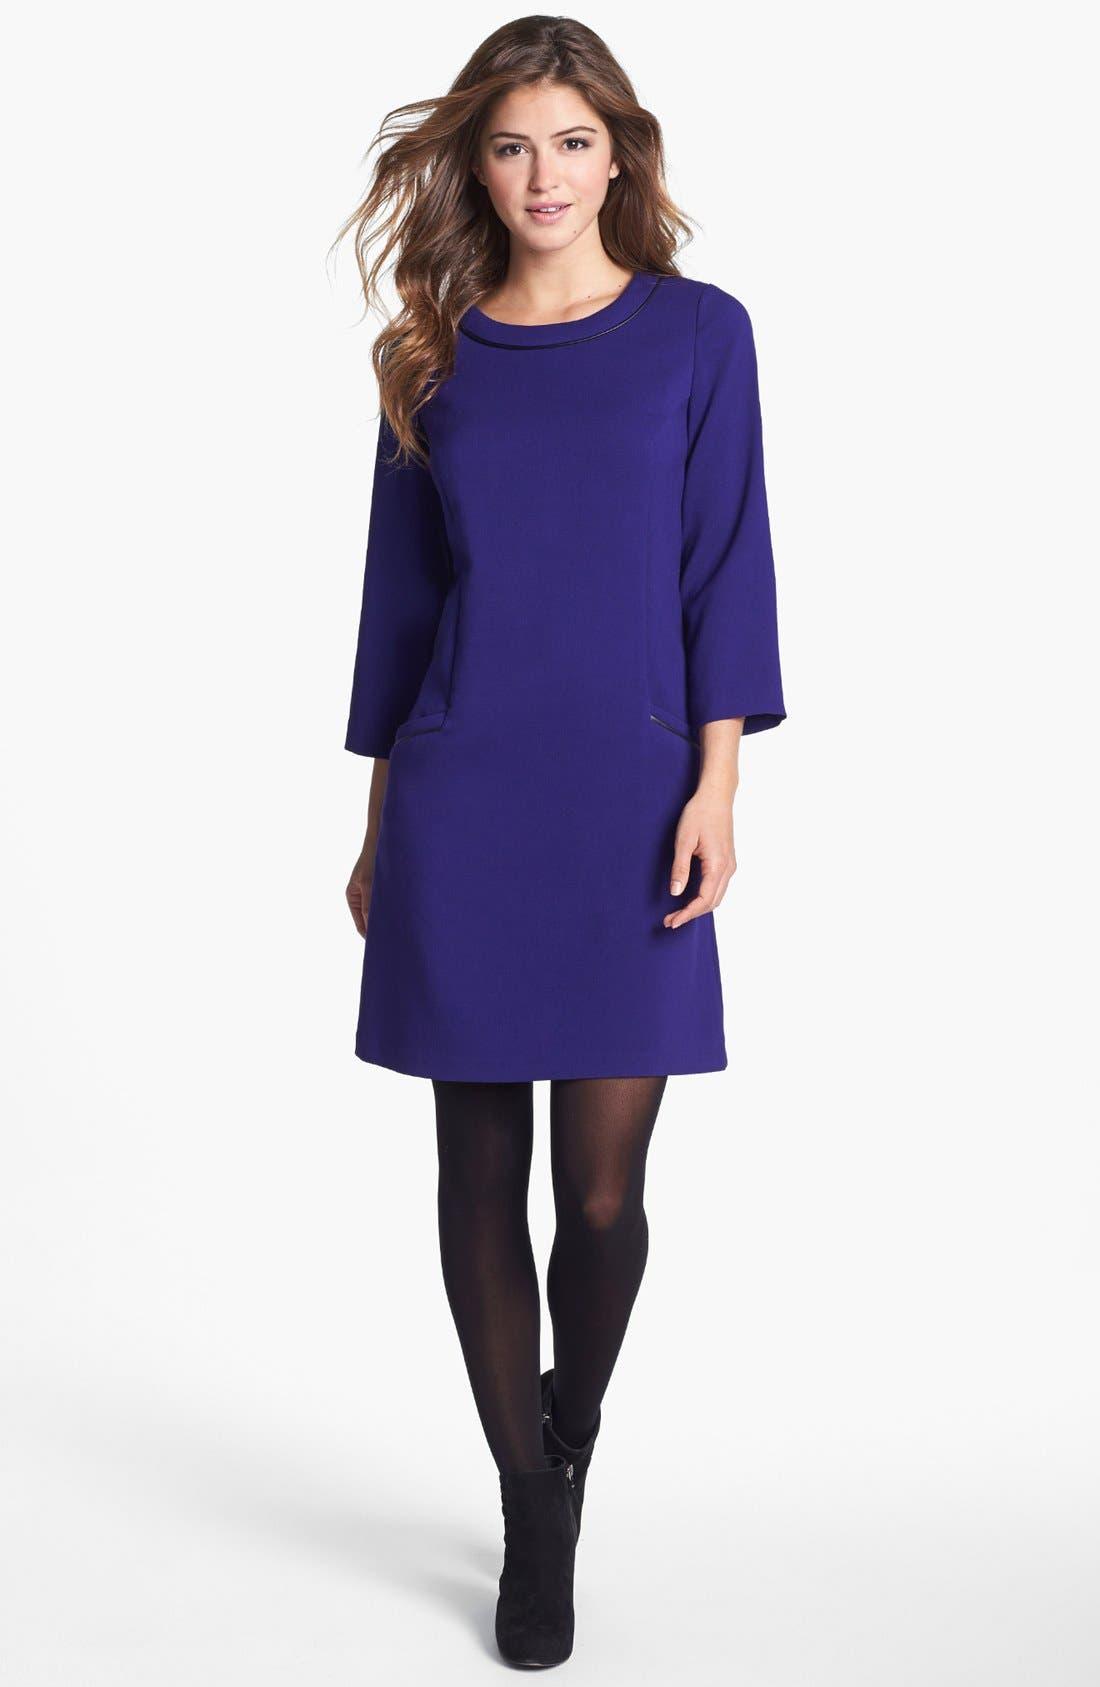 Alternate Image 1 Selected - Eliza J Faux Leather Trim Shift Dress